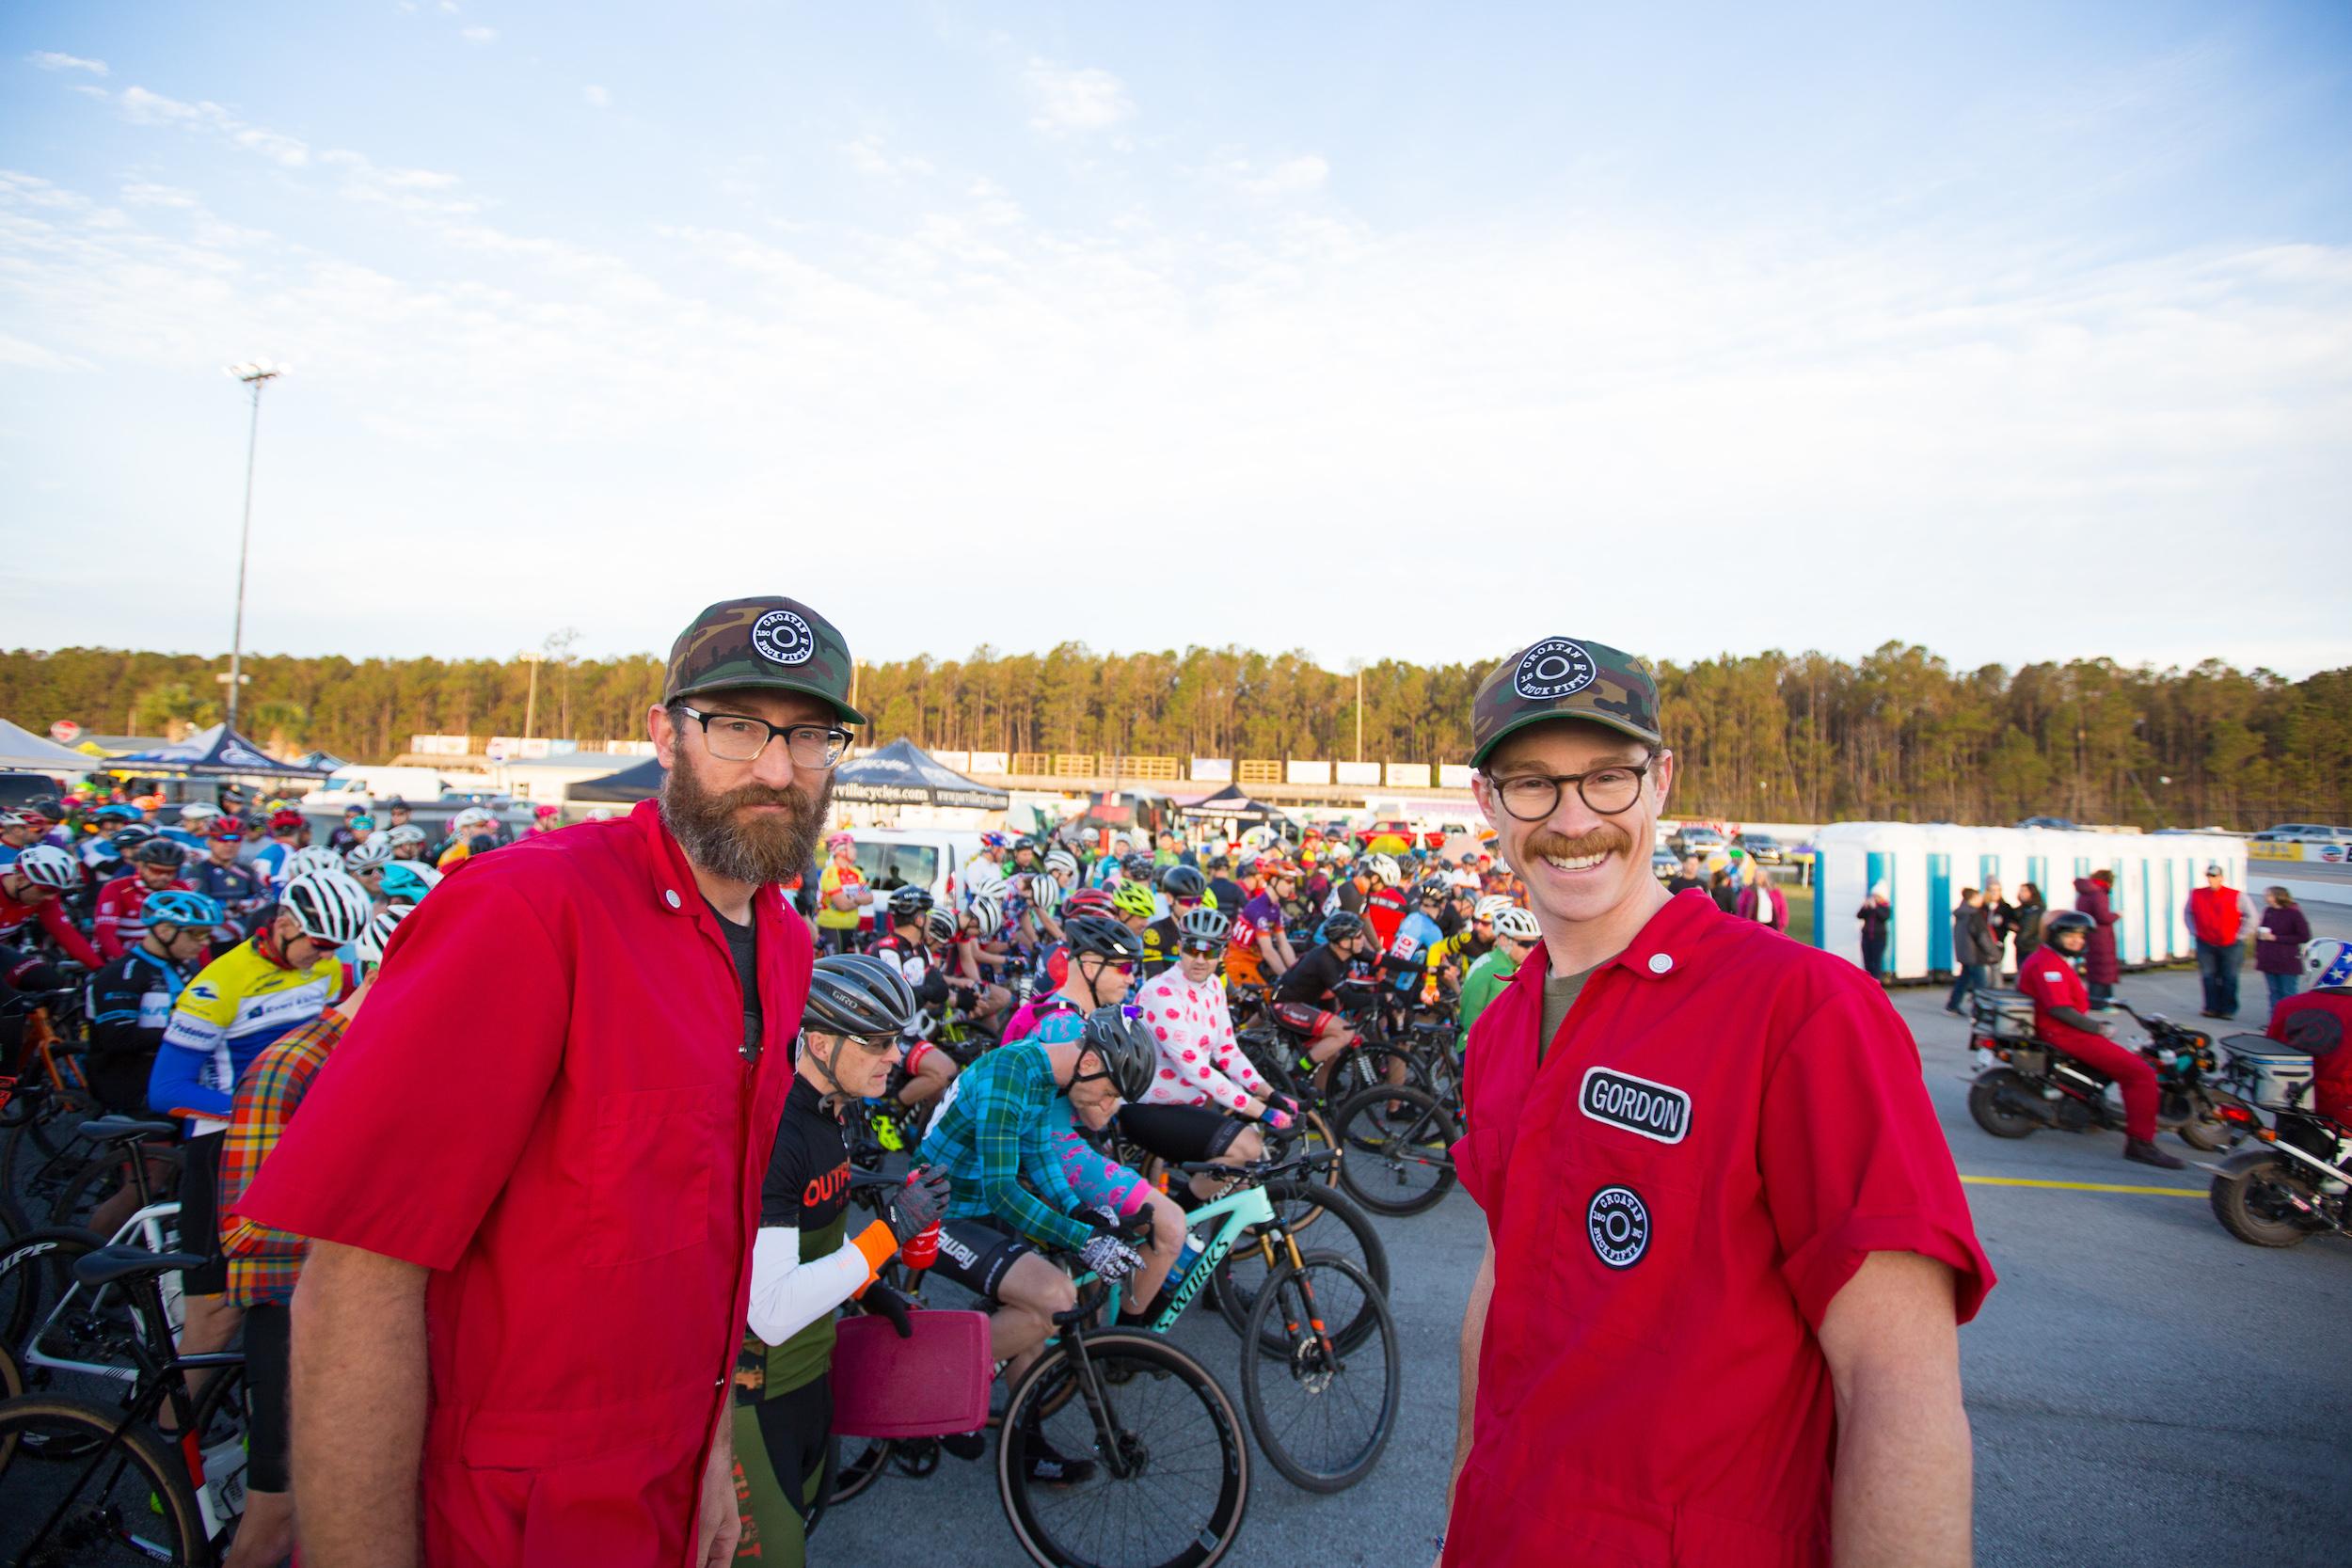 Croatan Buck Fifty race directors Matt Hawkins and Gordon Wadsworth. PC: Jack Looney